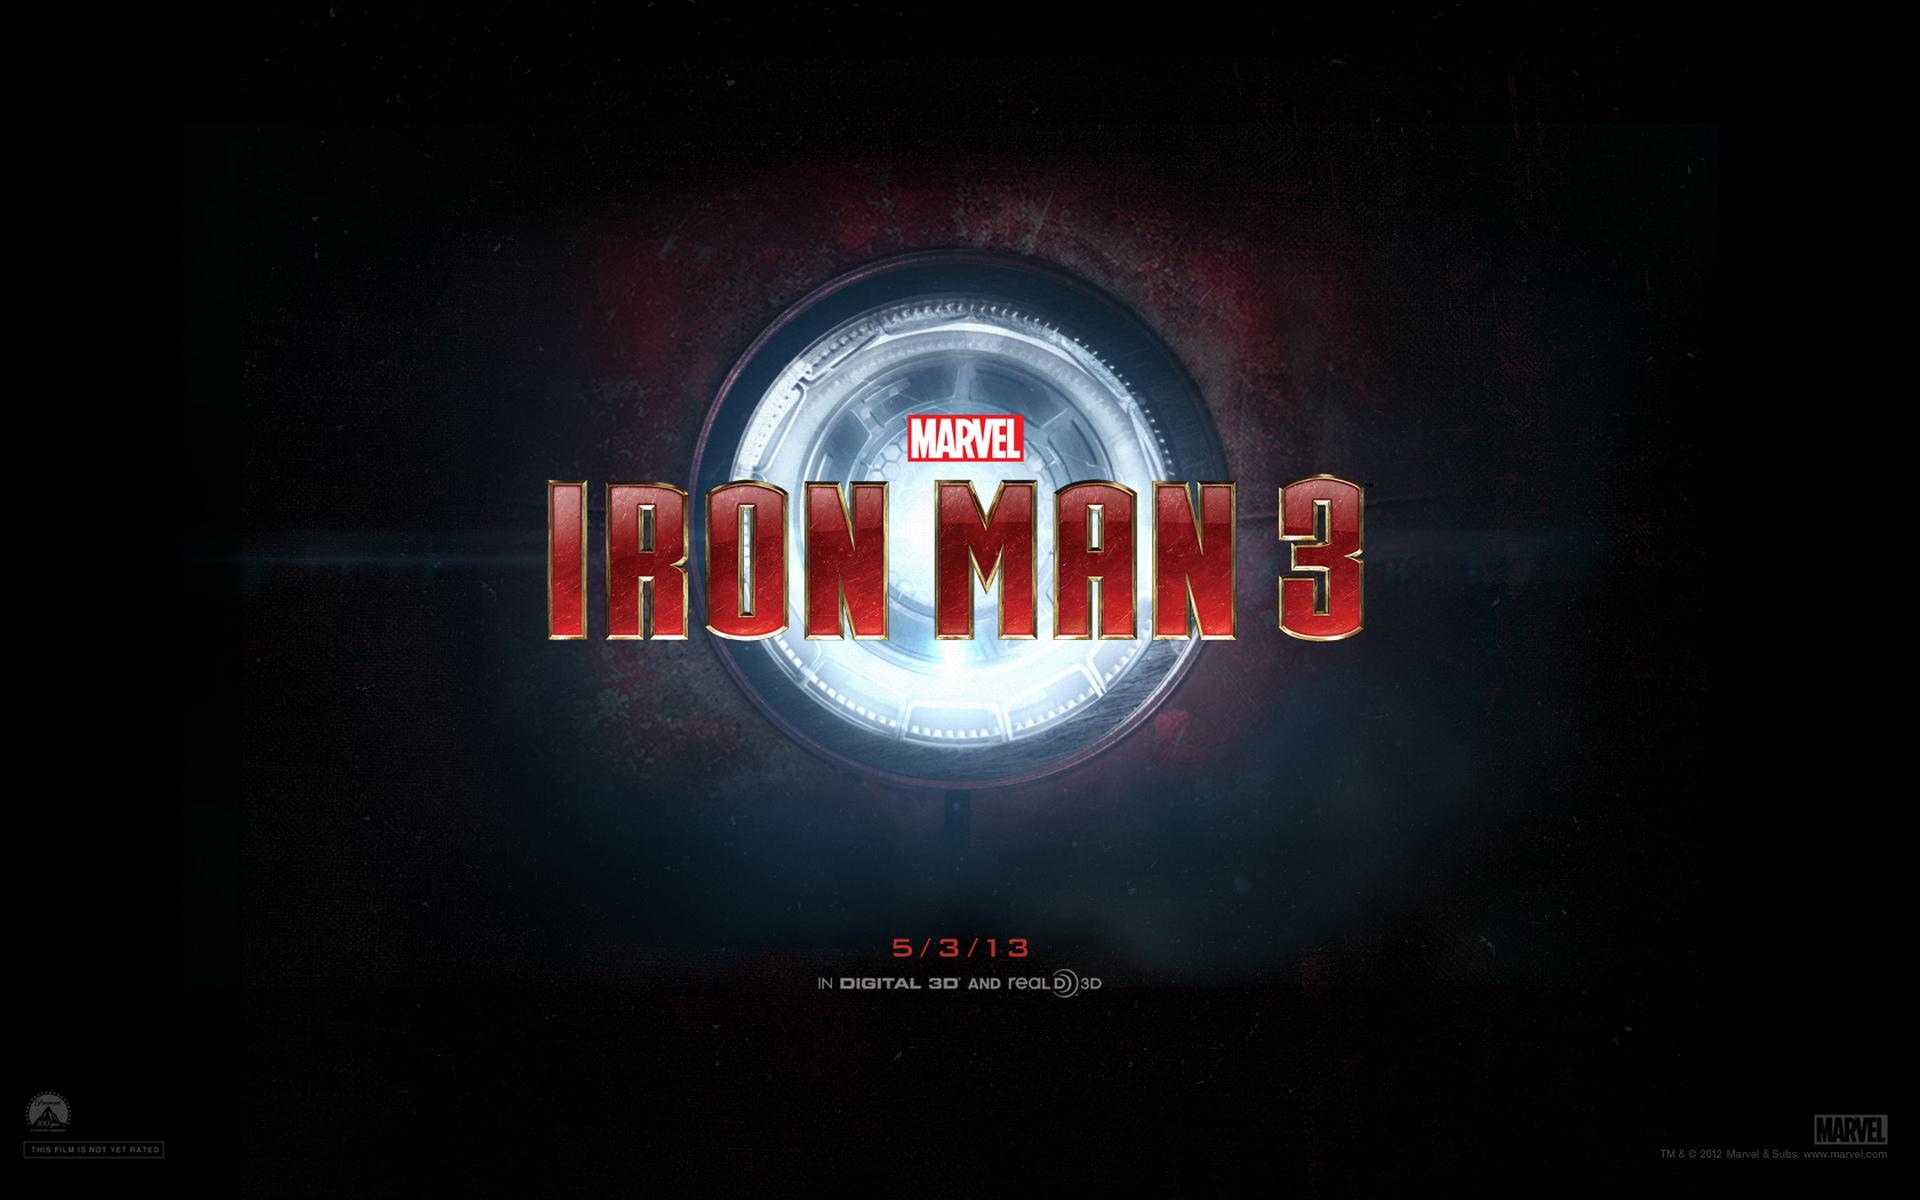 Iron Man 3 wallpaper 11